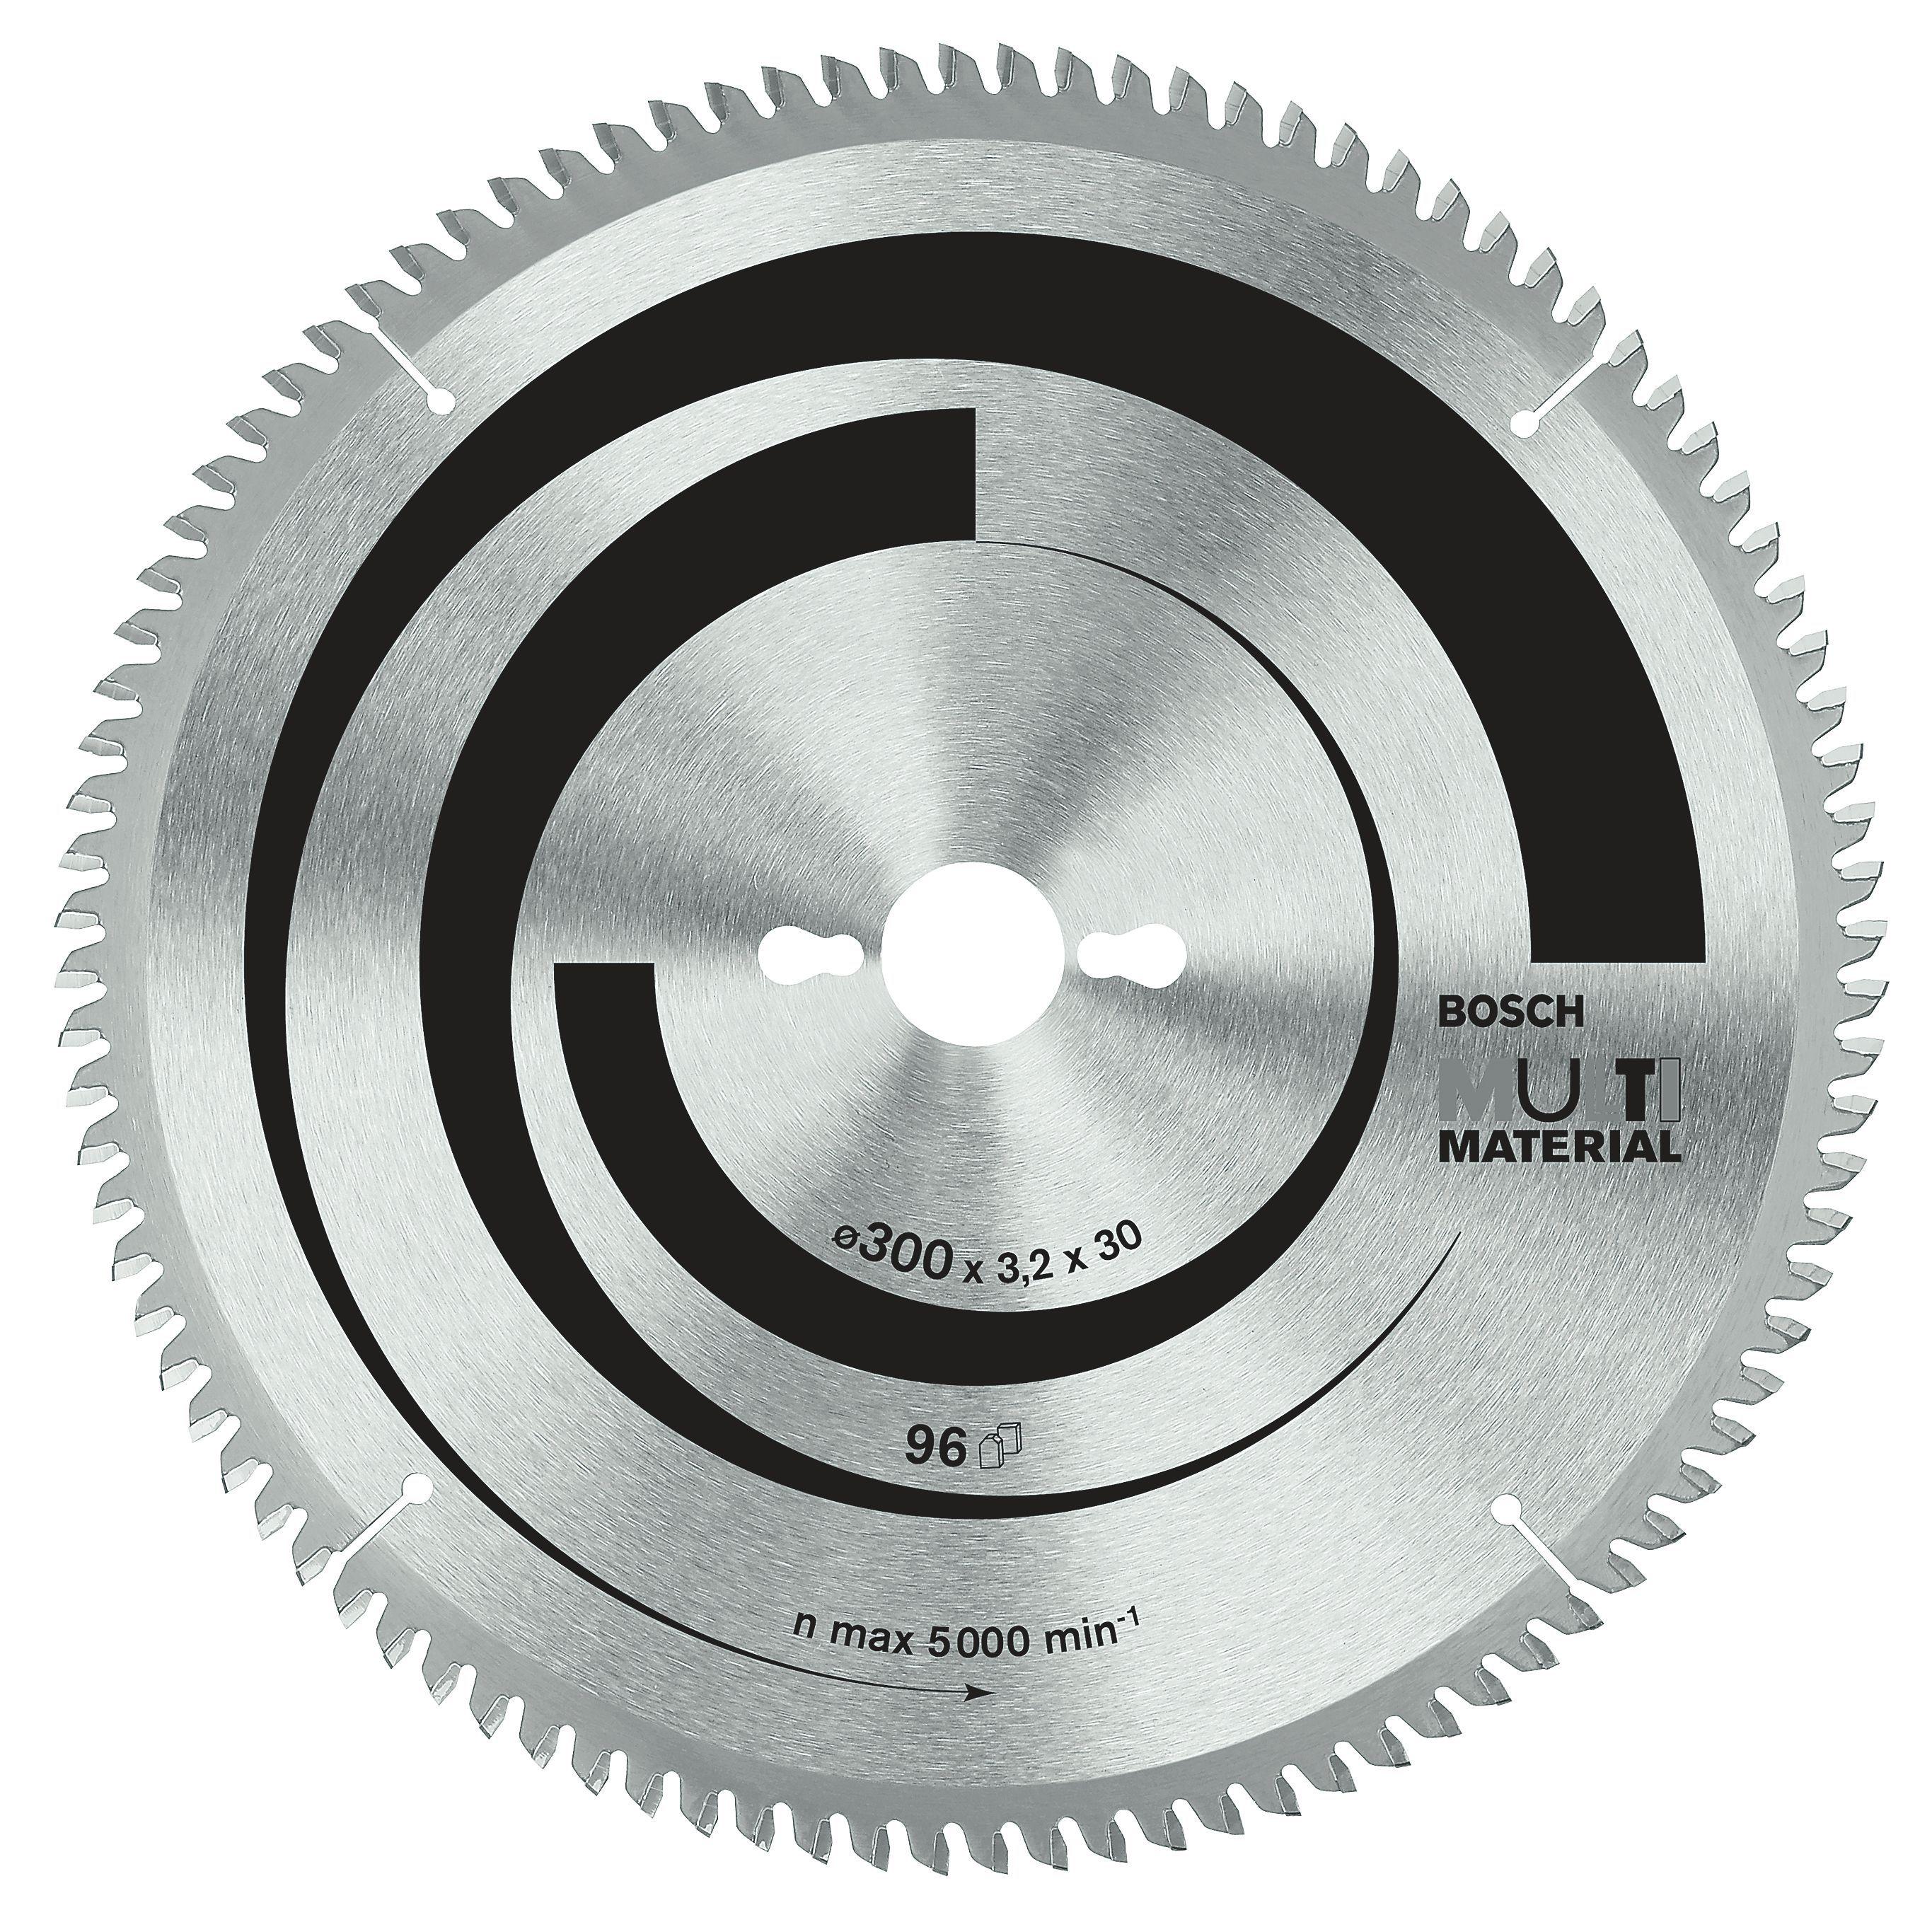 Bosch 80t Circular Saw Blade (dia)305mm